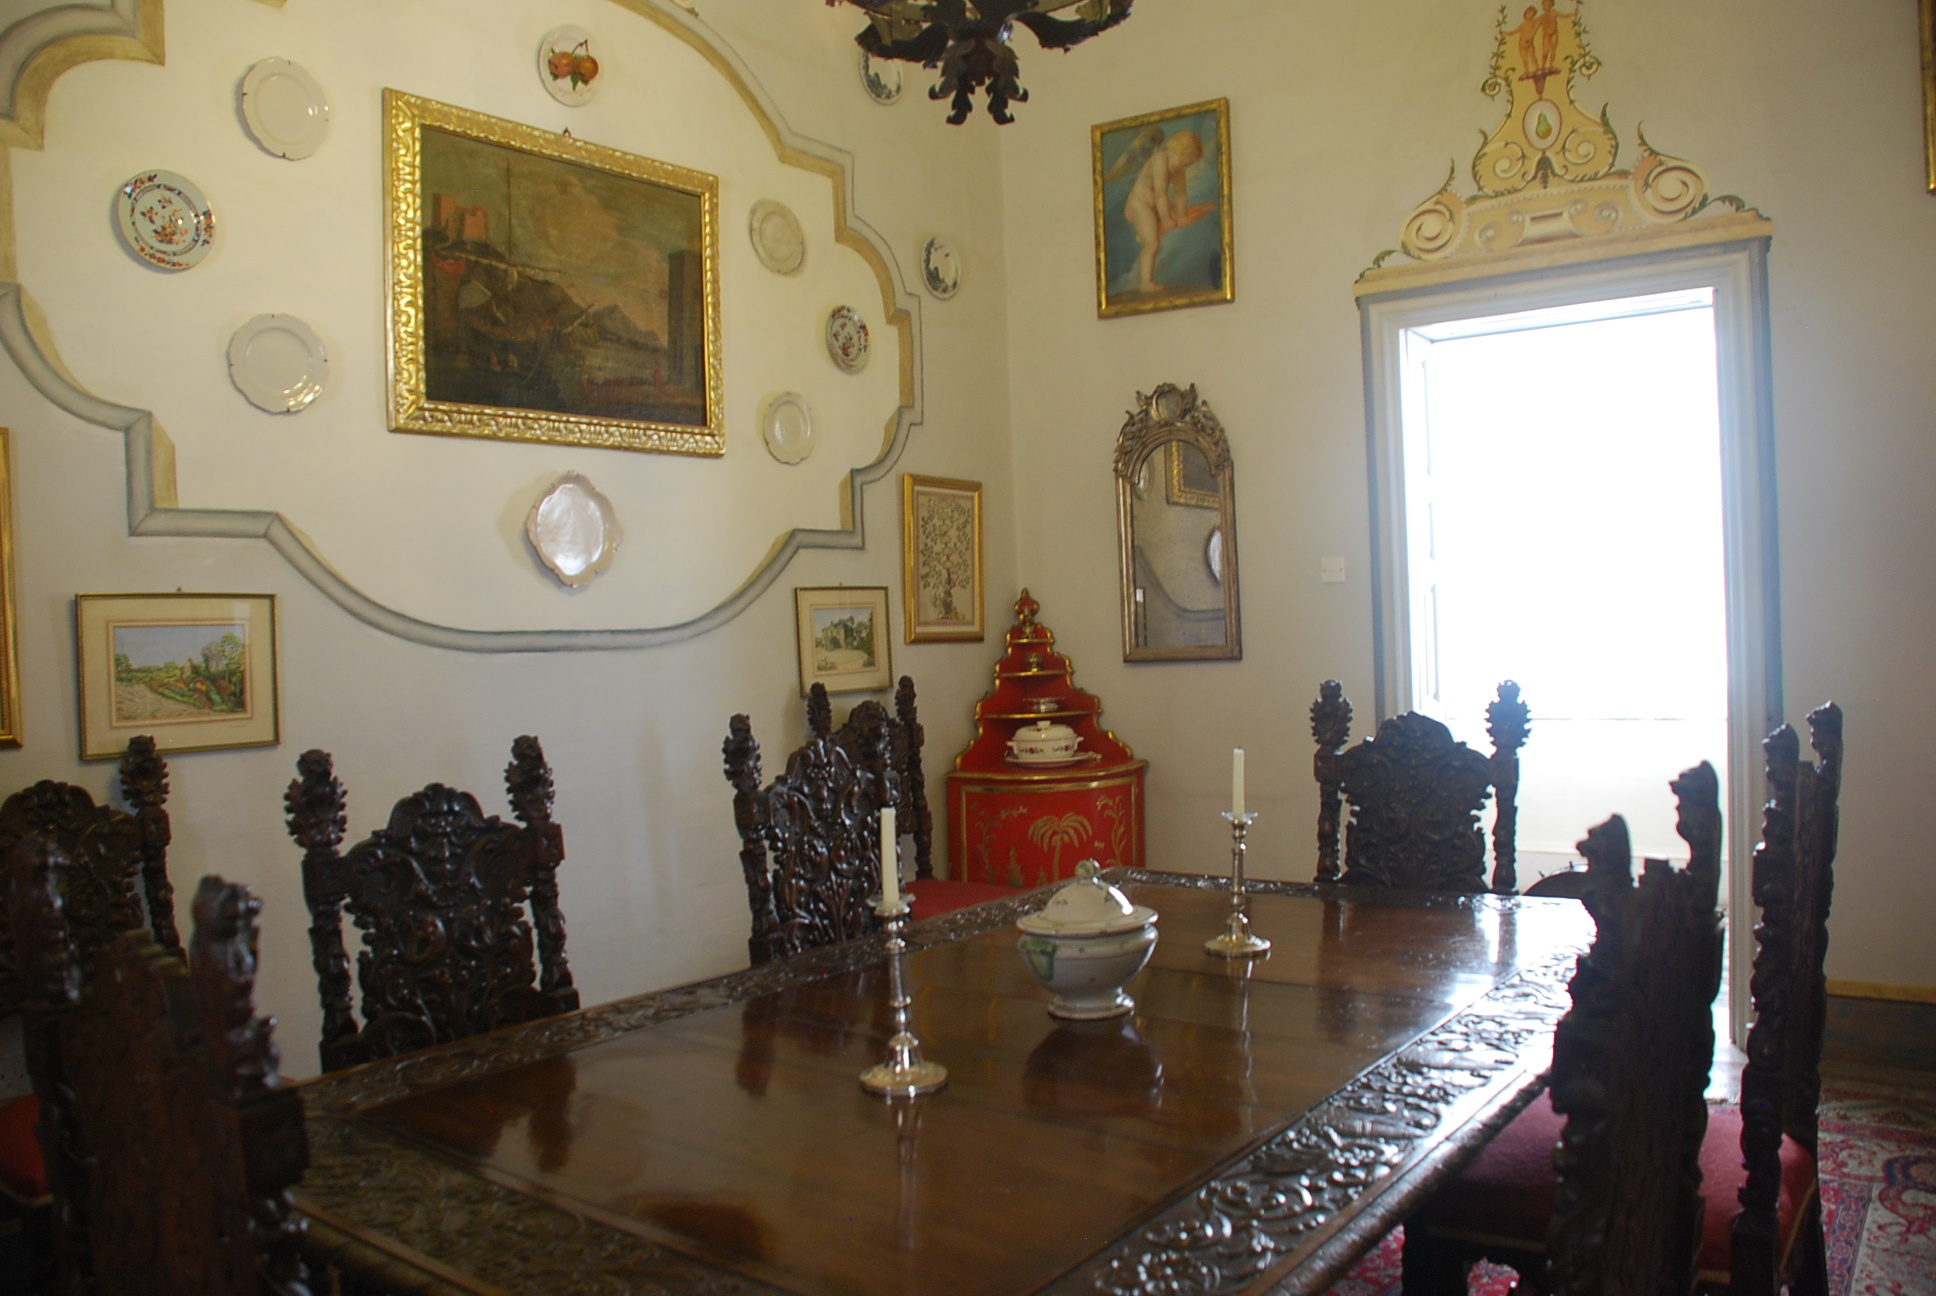 casaroccapiccola-malta-travelblog-moldova (3)